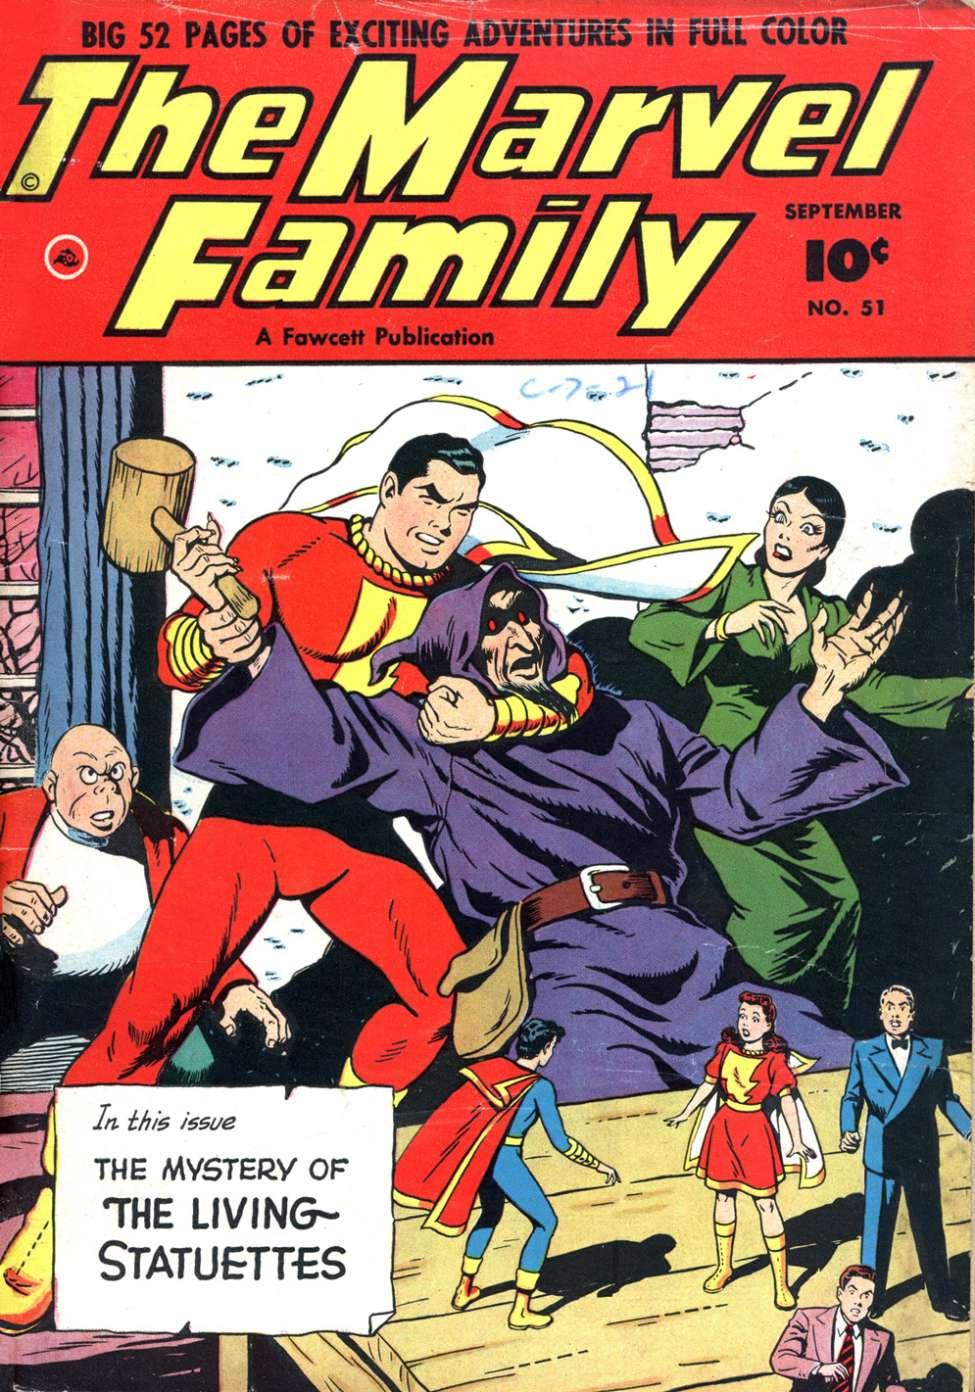 The Marvel Family #51 (Fawcett) - Comic Book Plus